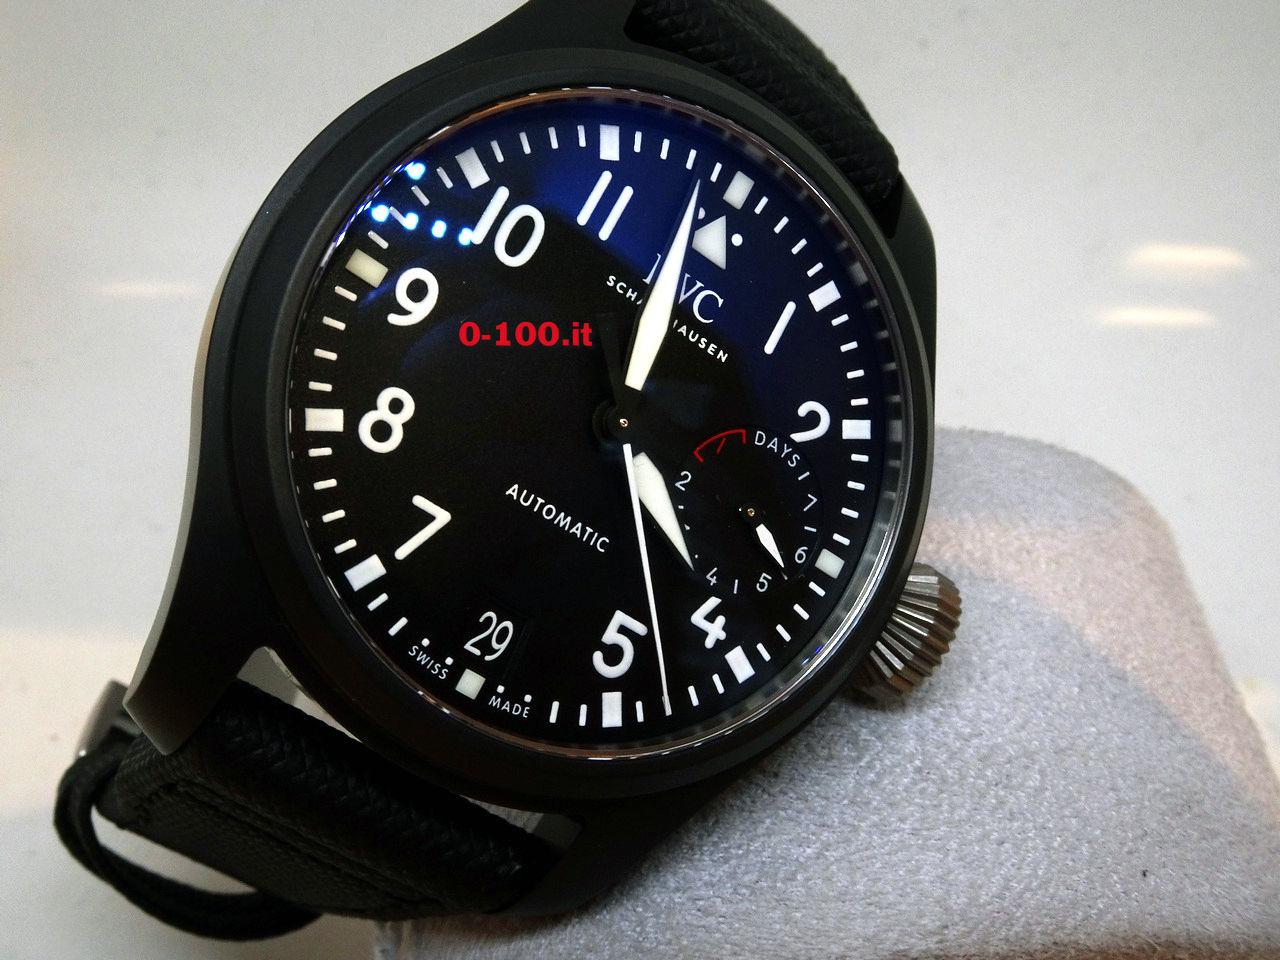 IWC_pilot_heritage-0-100_45